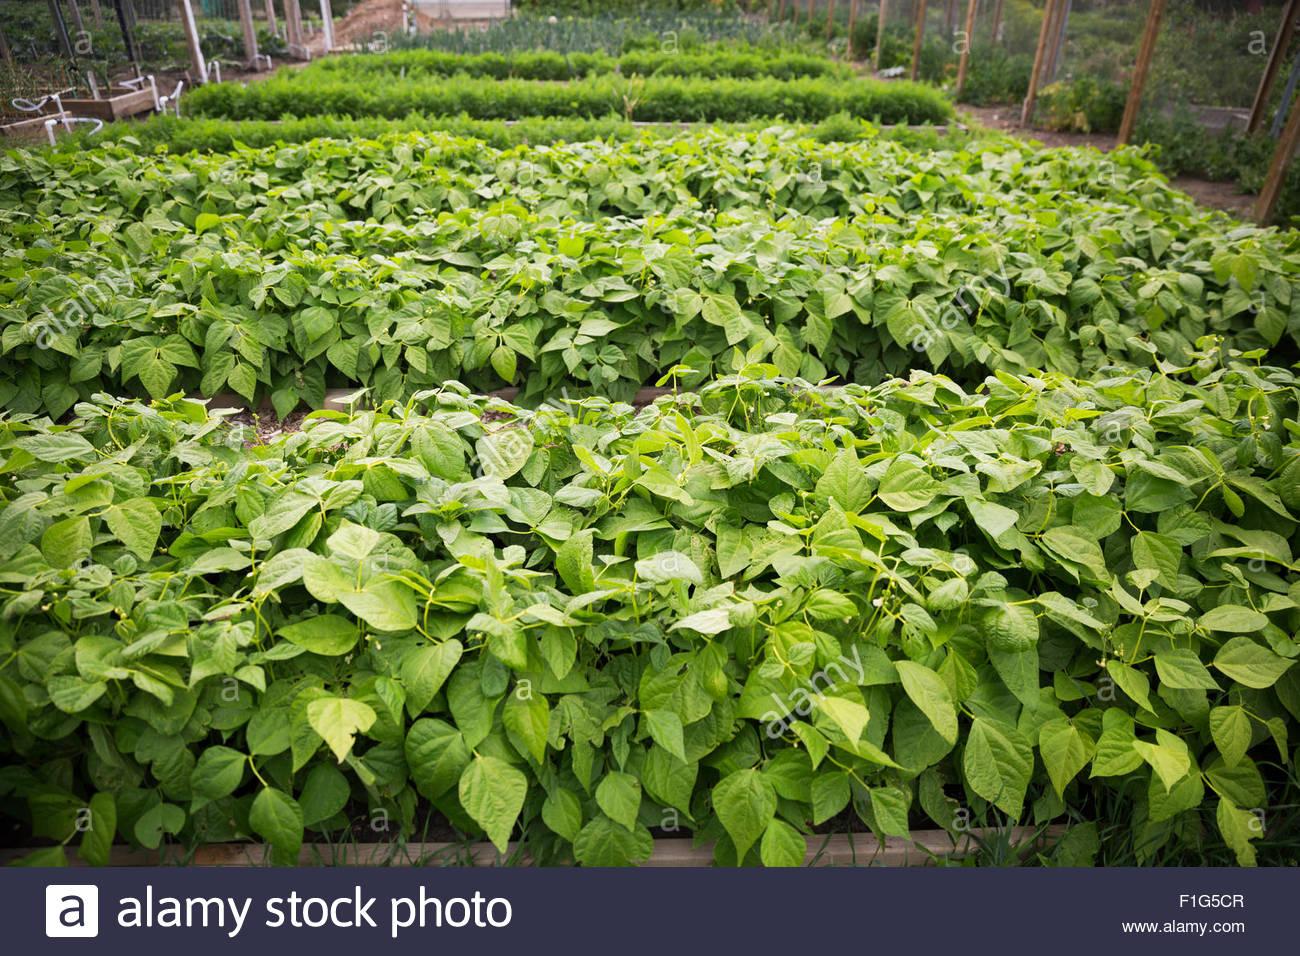 Plants growing in rows in garden - Stock Image